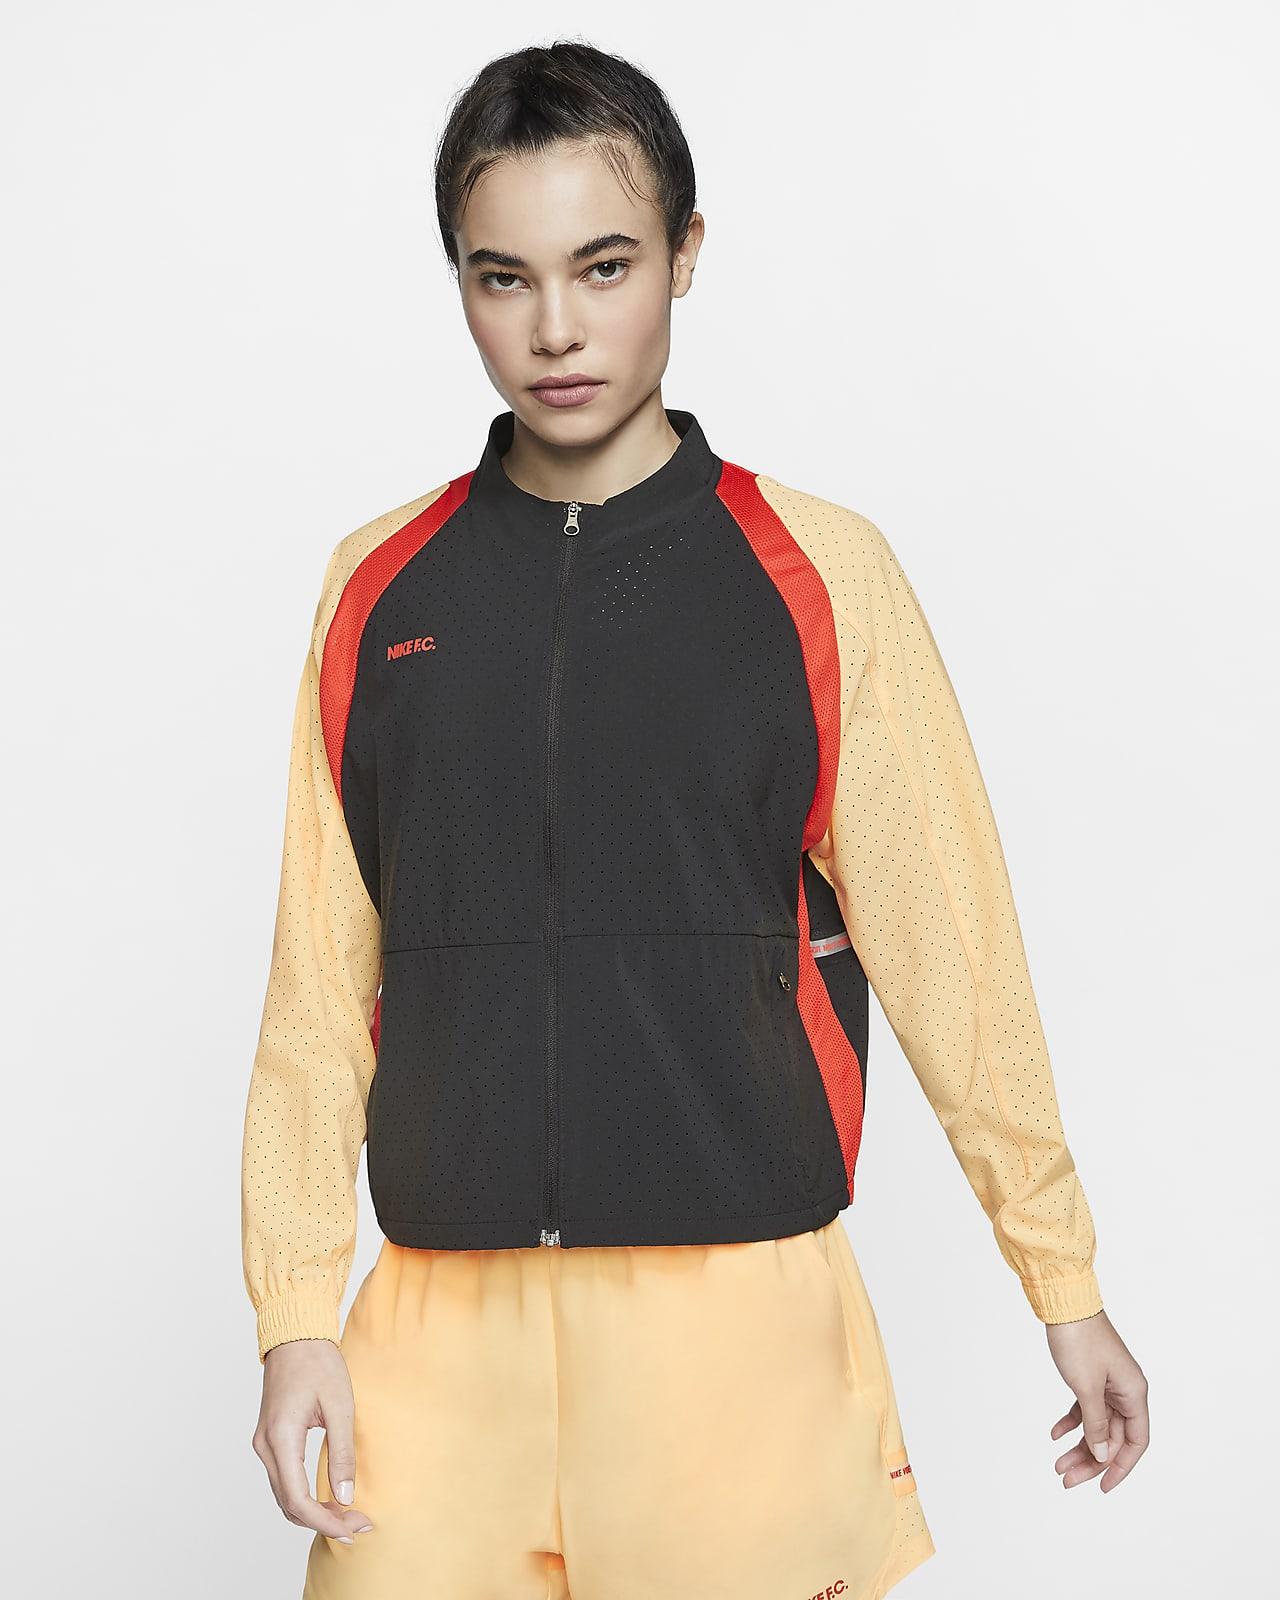 Nike F.C. Germany Women's Full-Zip Football Jacket